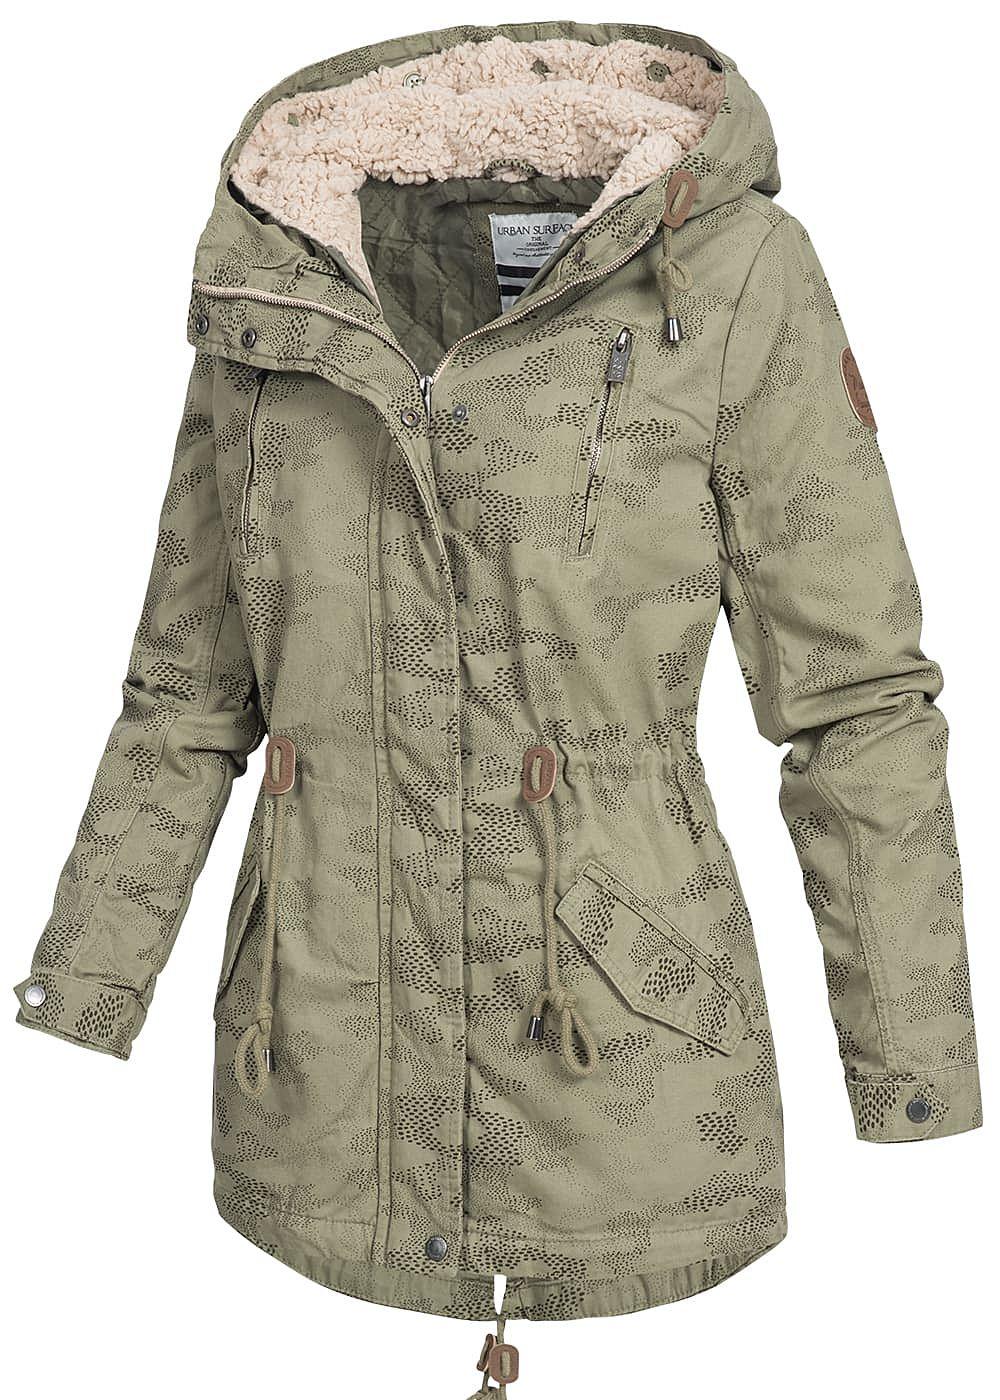 XL NEU!!! S URBAN SURFACE Damen Parka Jacke schwarz oliv grün Kapuze Gr L M